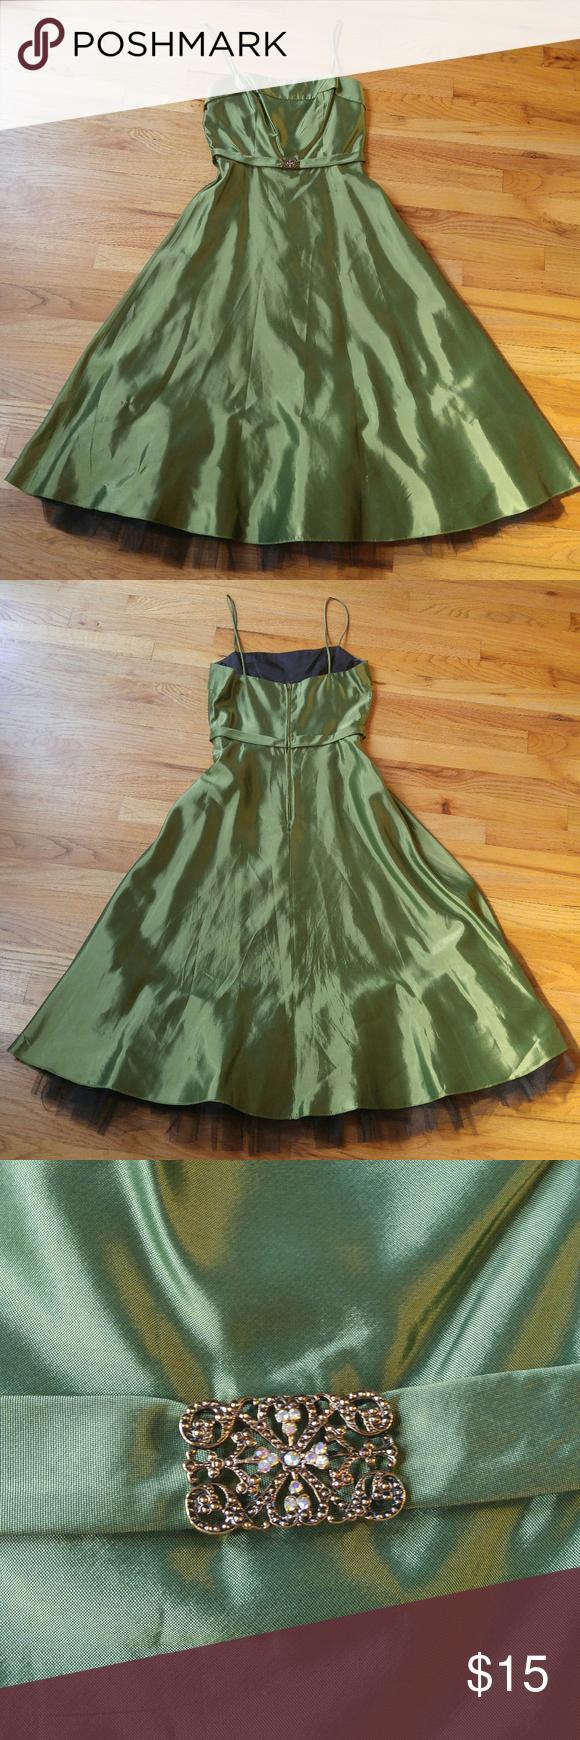 Olive green formal prom dress w sparkle accent my posh picks